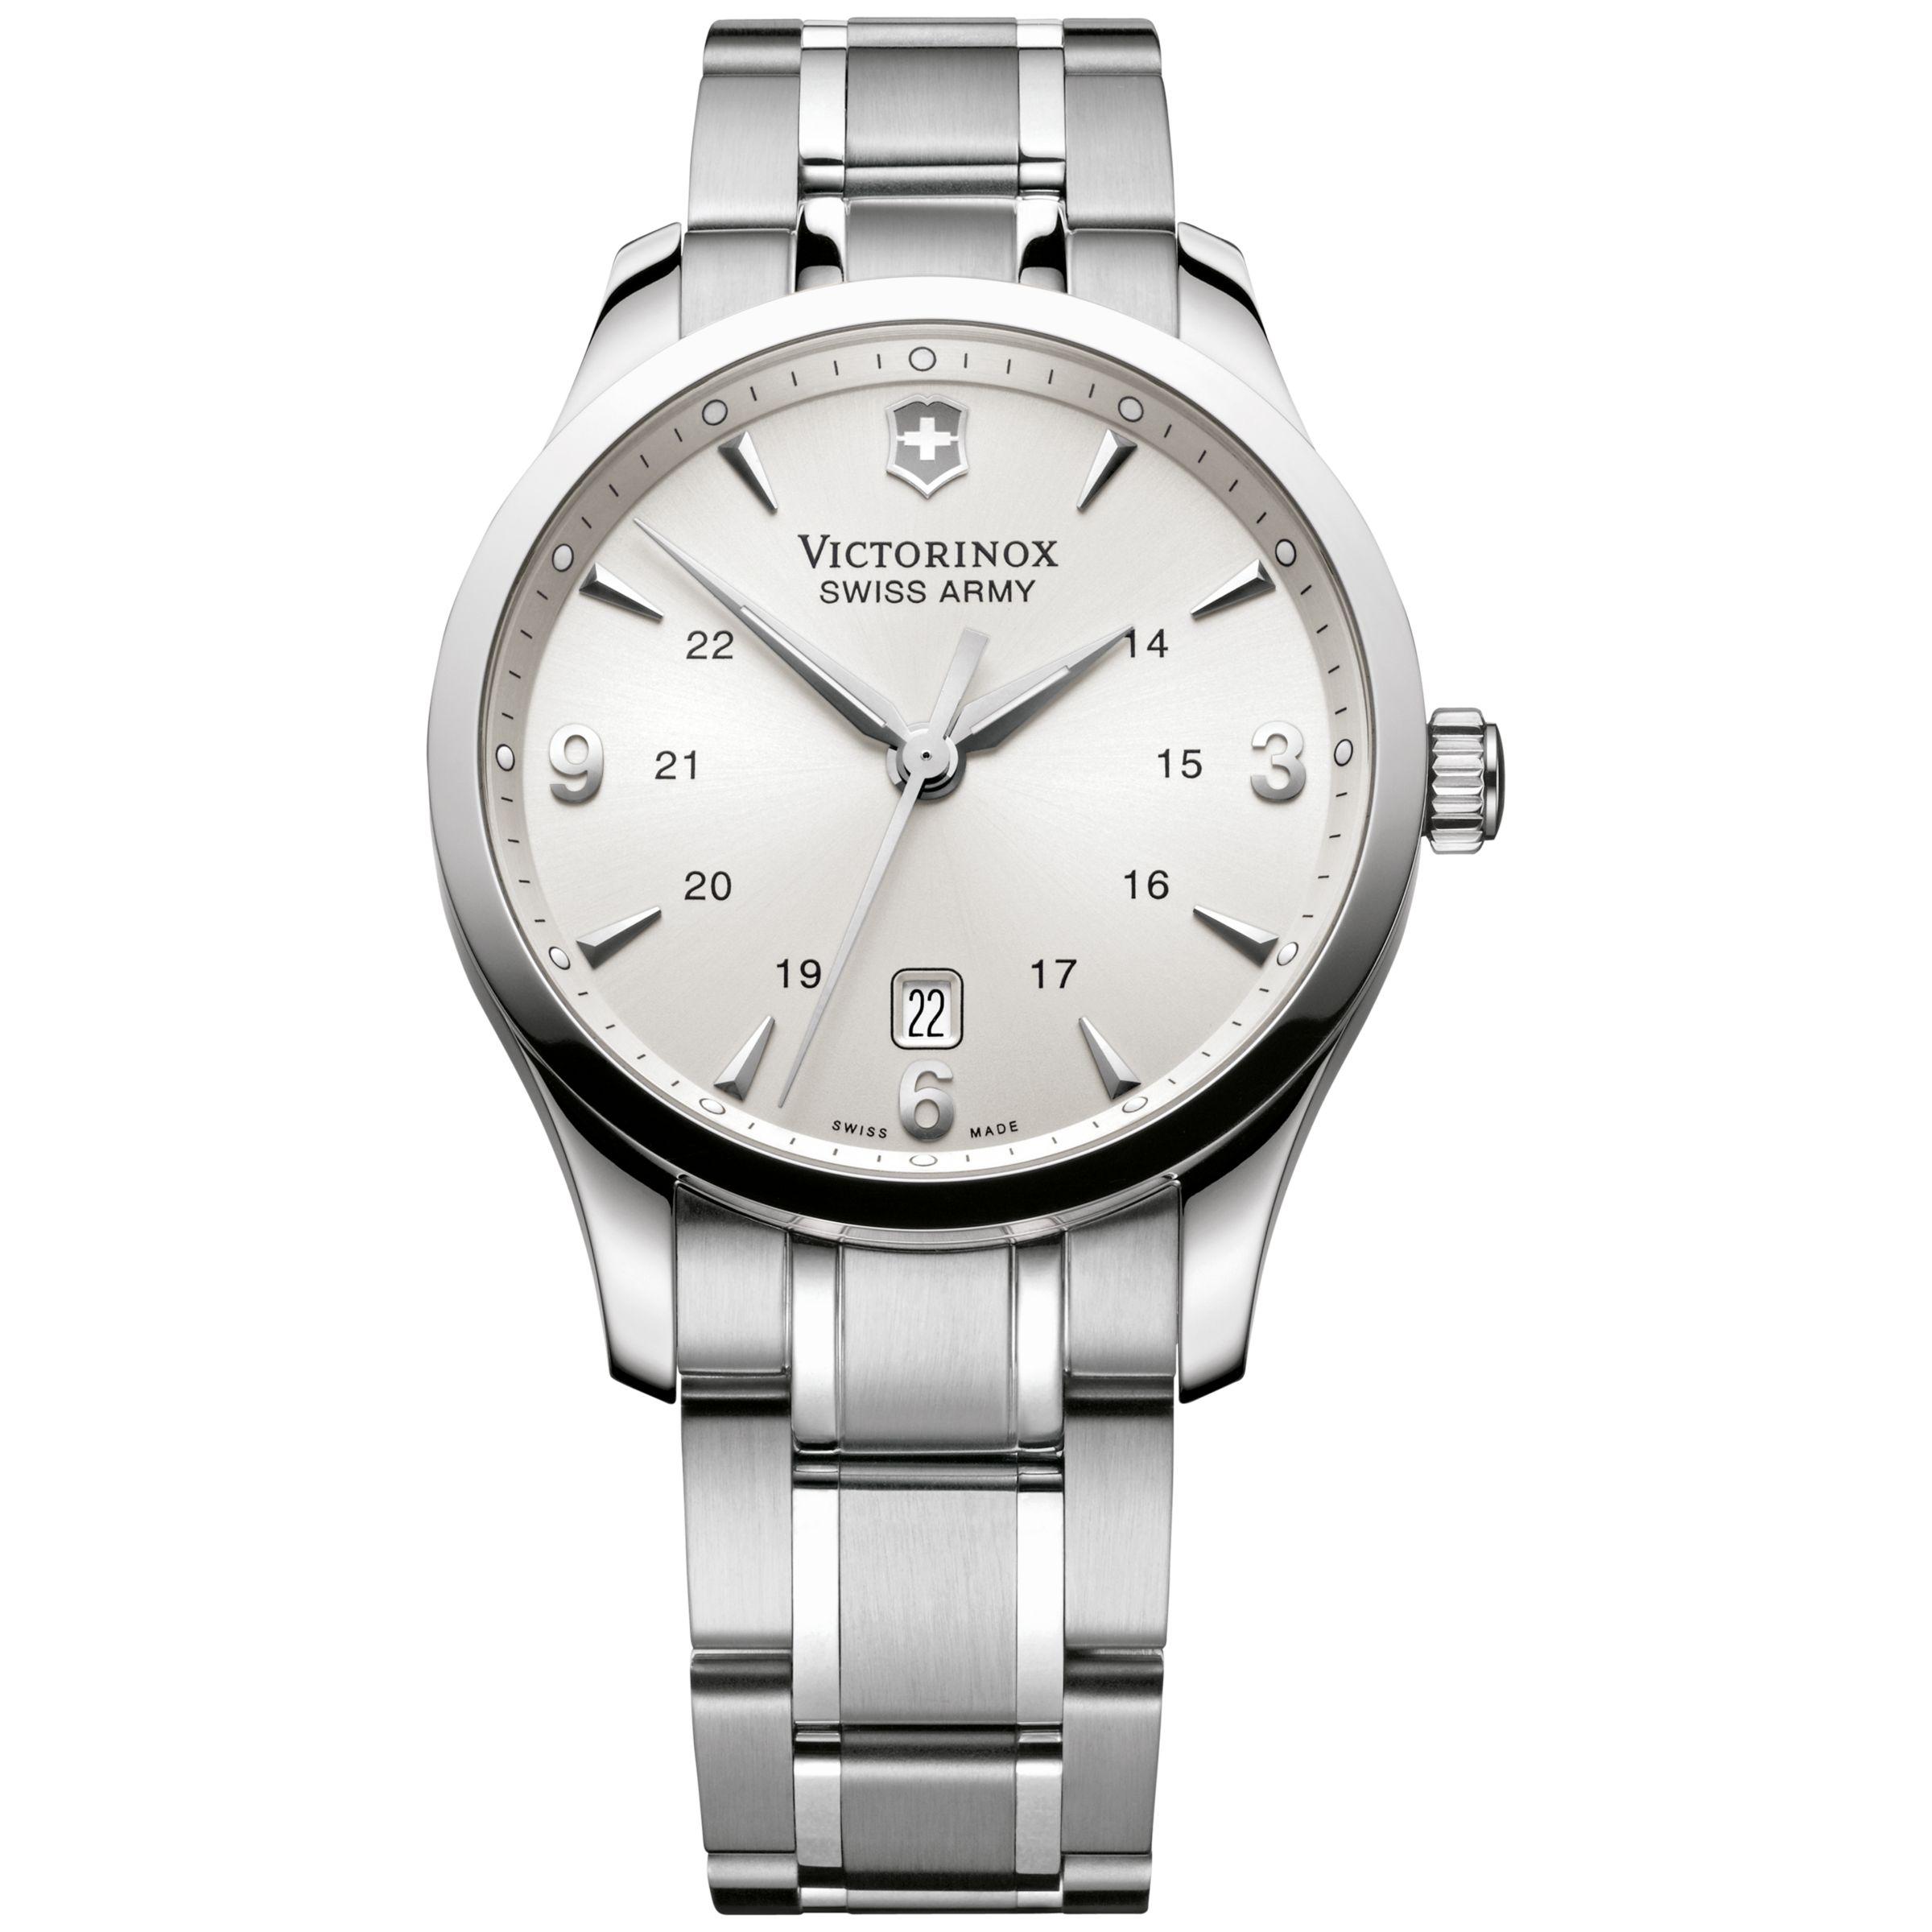 Victorinox Victorinox 241476 Men's Alliance Bracelet Strap Watch, Silver